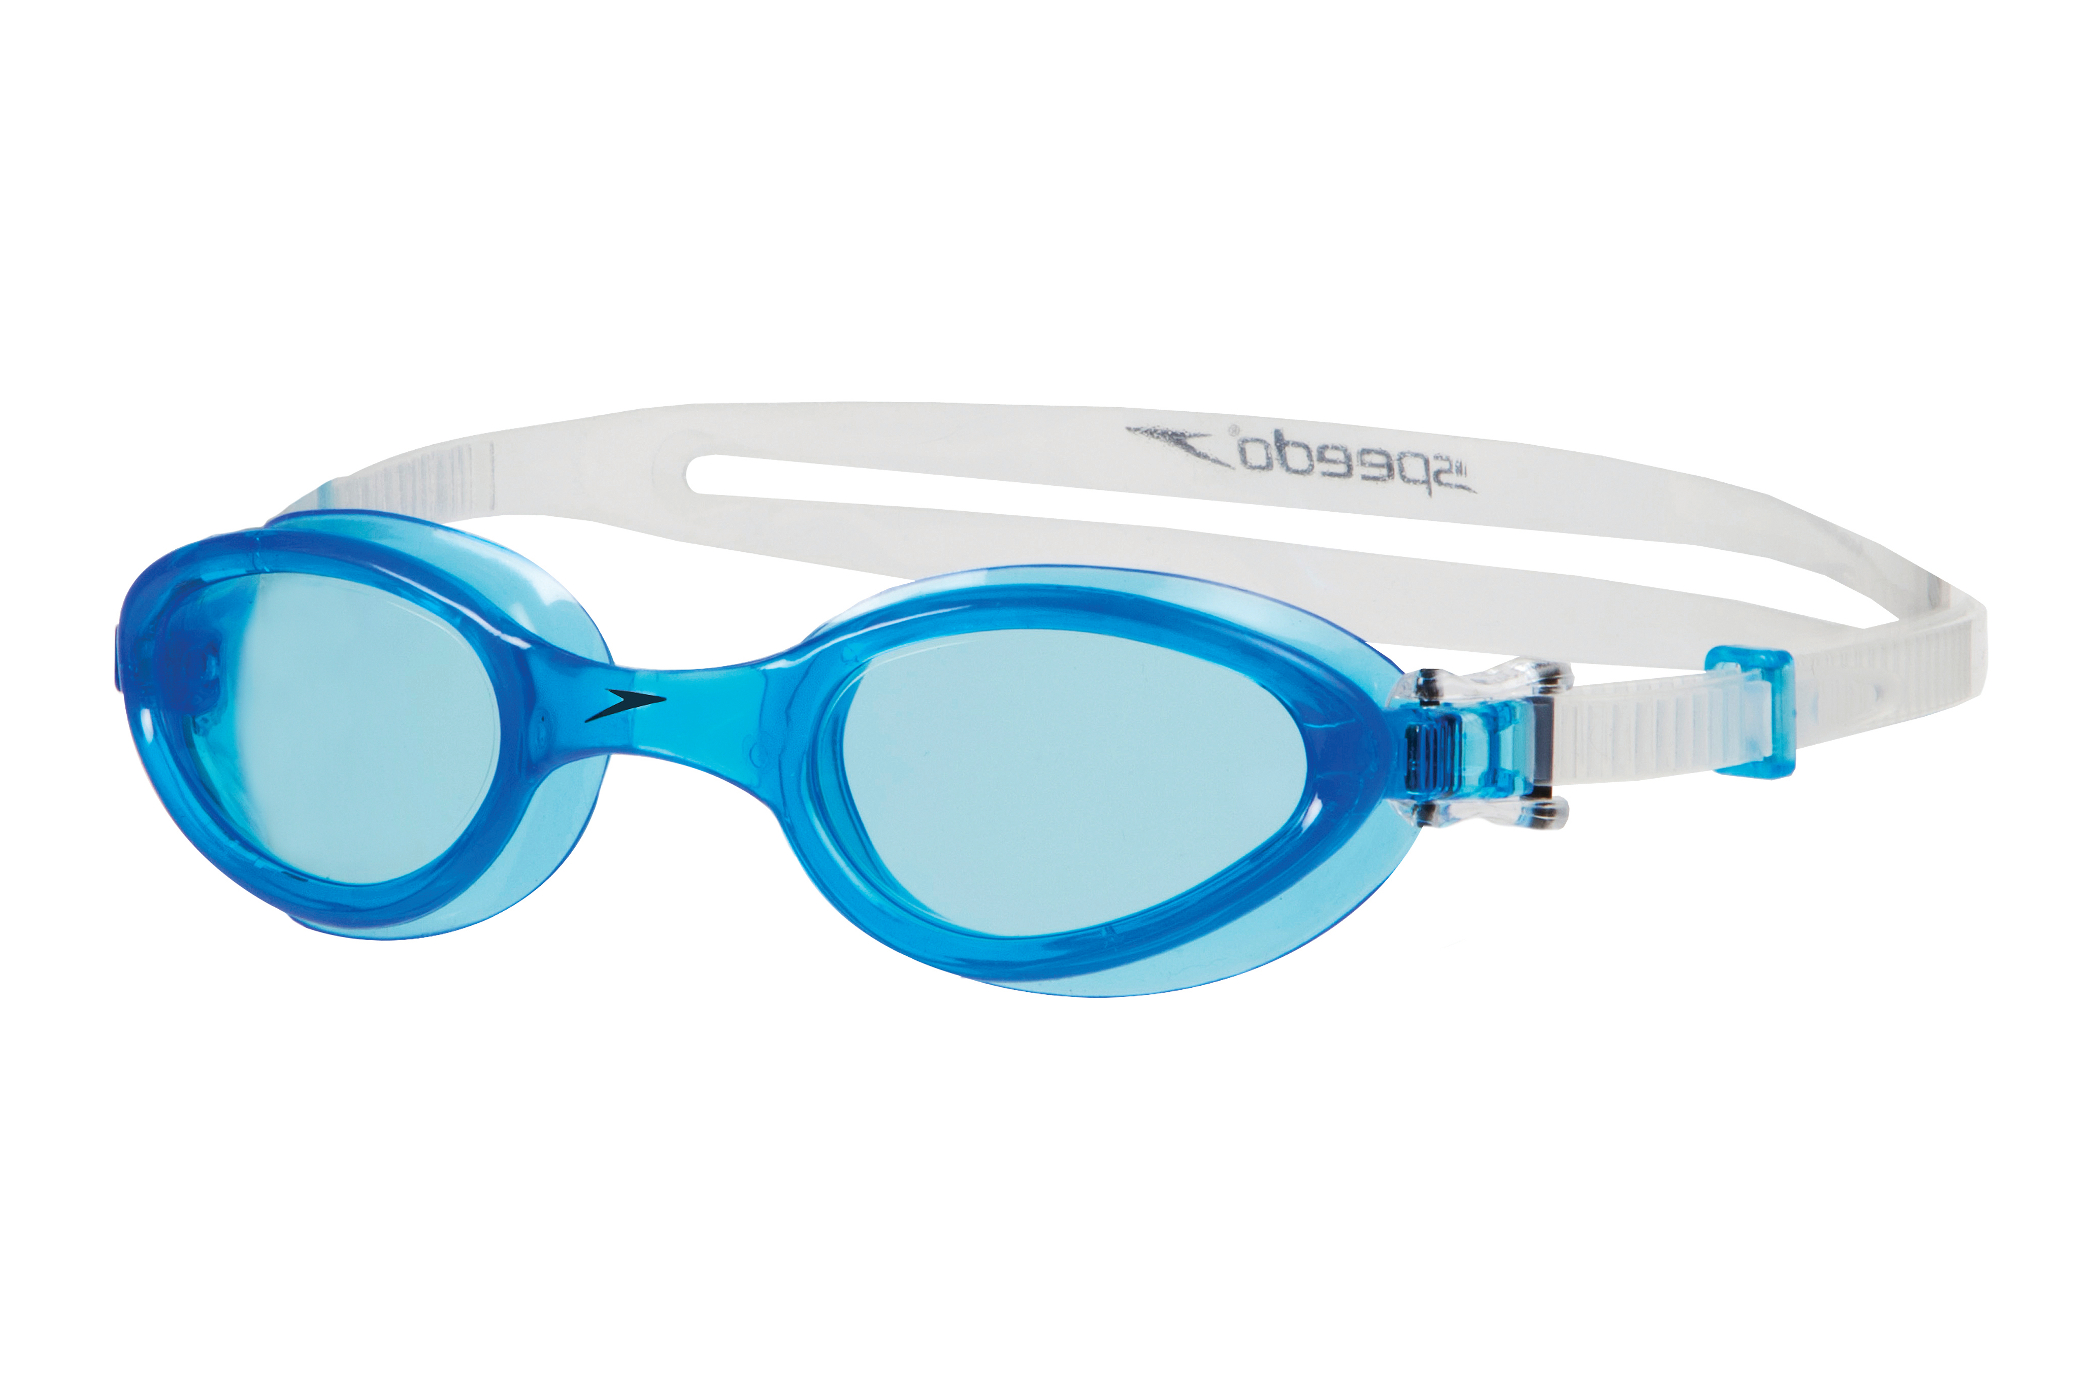 Speedo fastskin3 elite mirror lunettes de natation for Lunette de piscine de vue